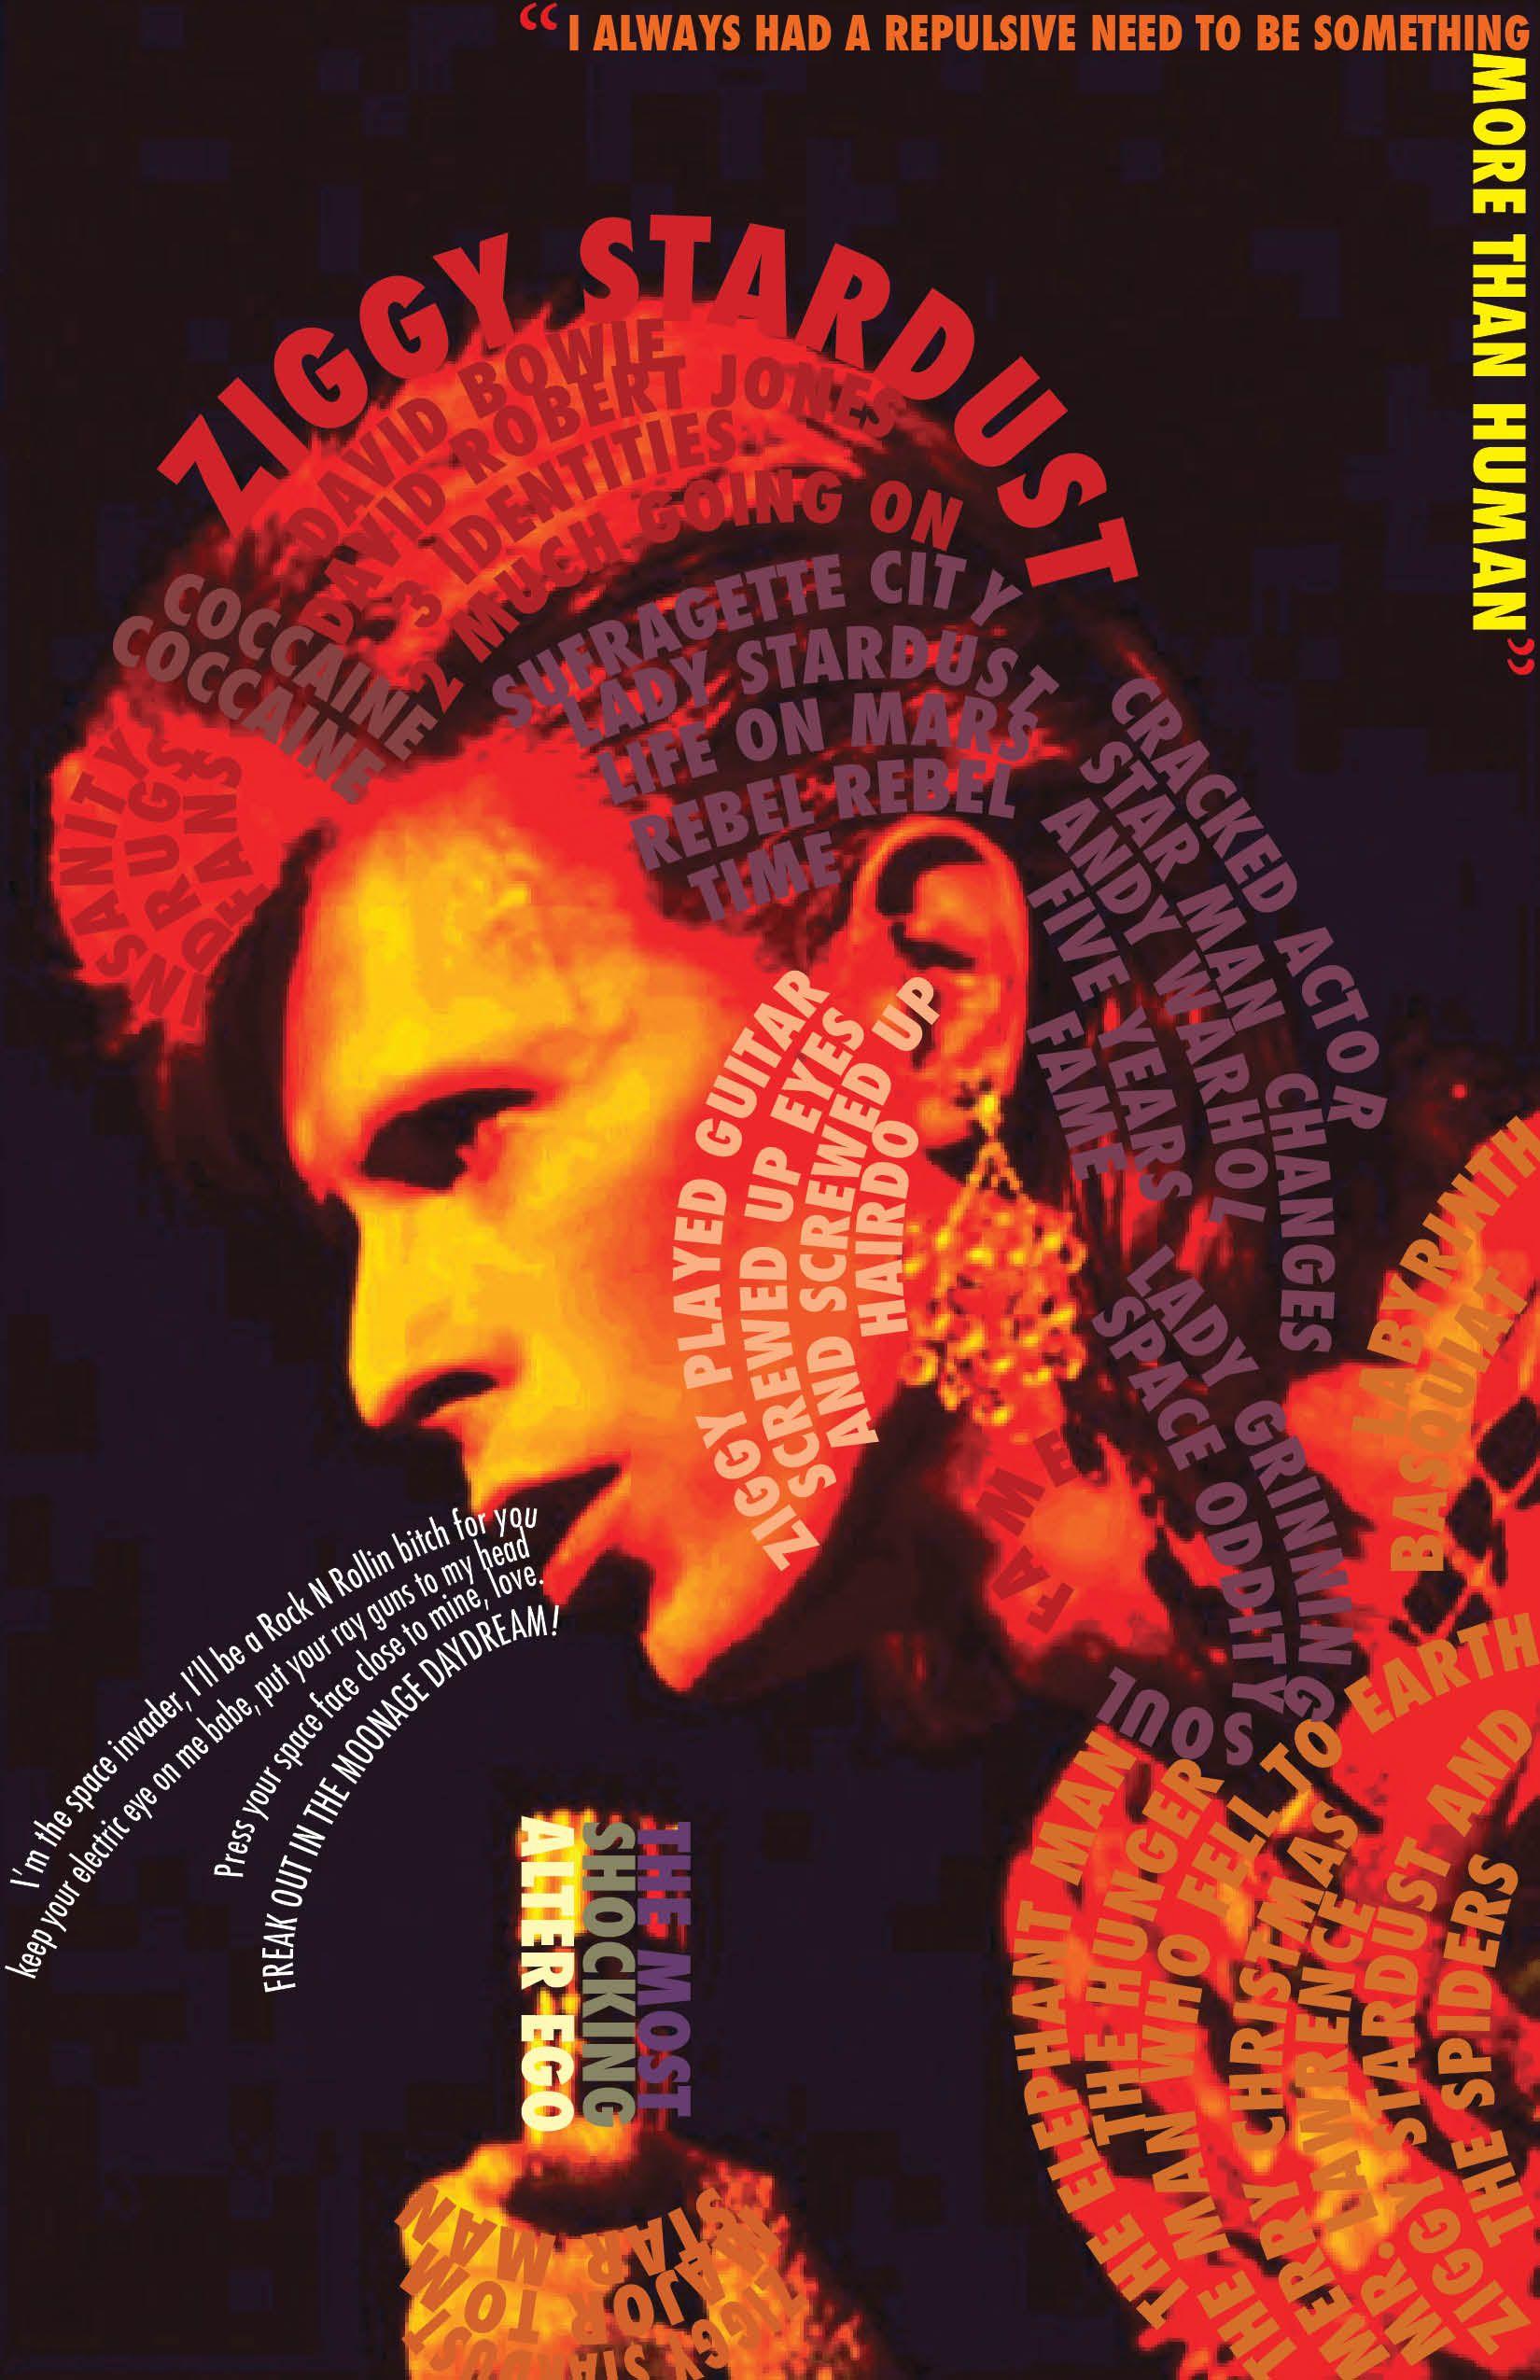 Original Ziggy Stardust Tour Poster